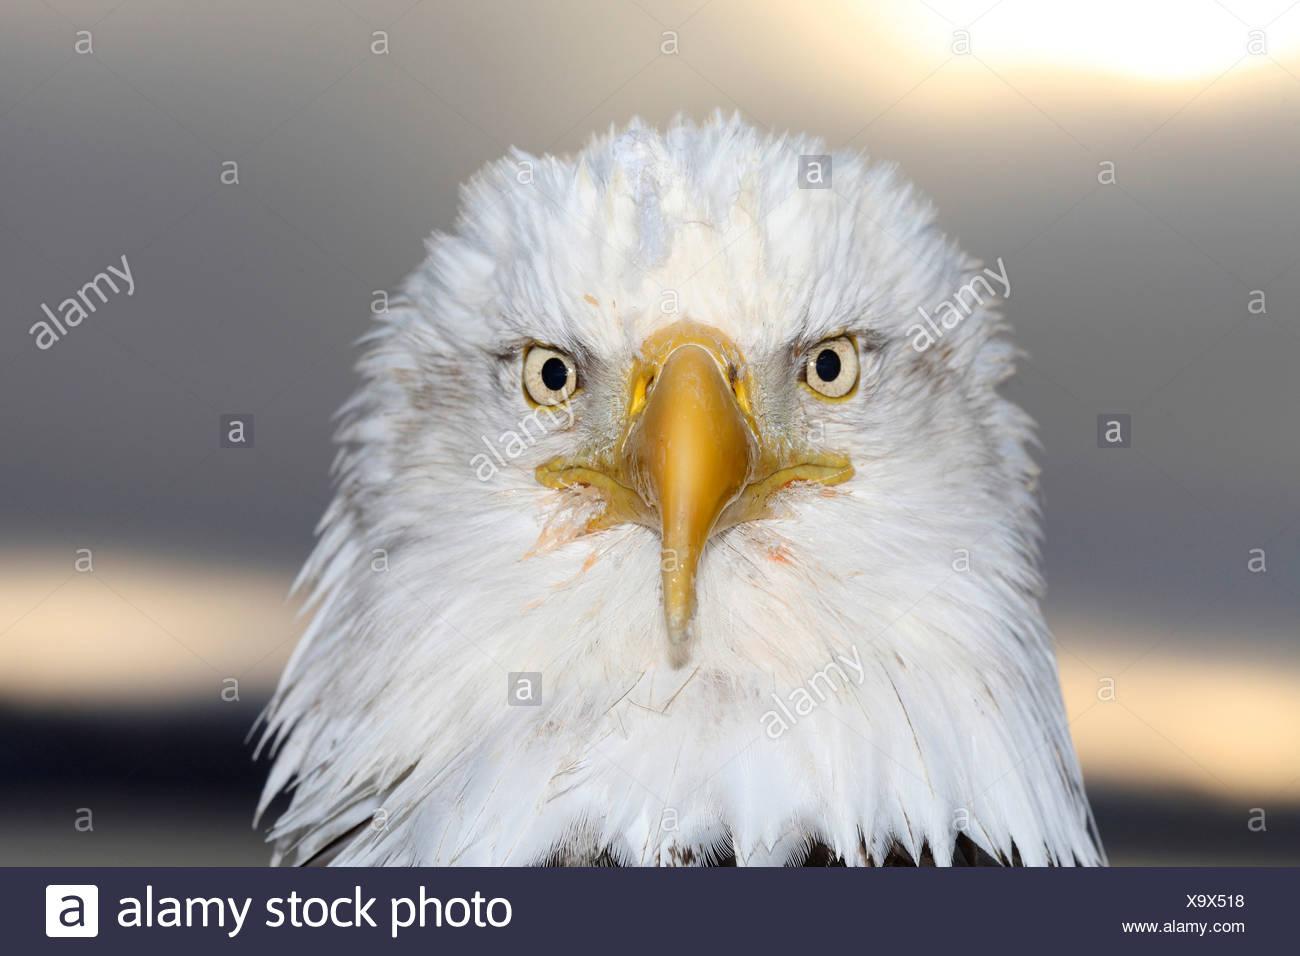 American bald eagle (Haliaeetus leucocephalus), portrait, USA, Alaska, Kenai - Stock Image